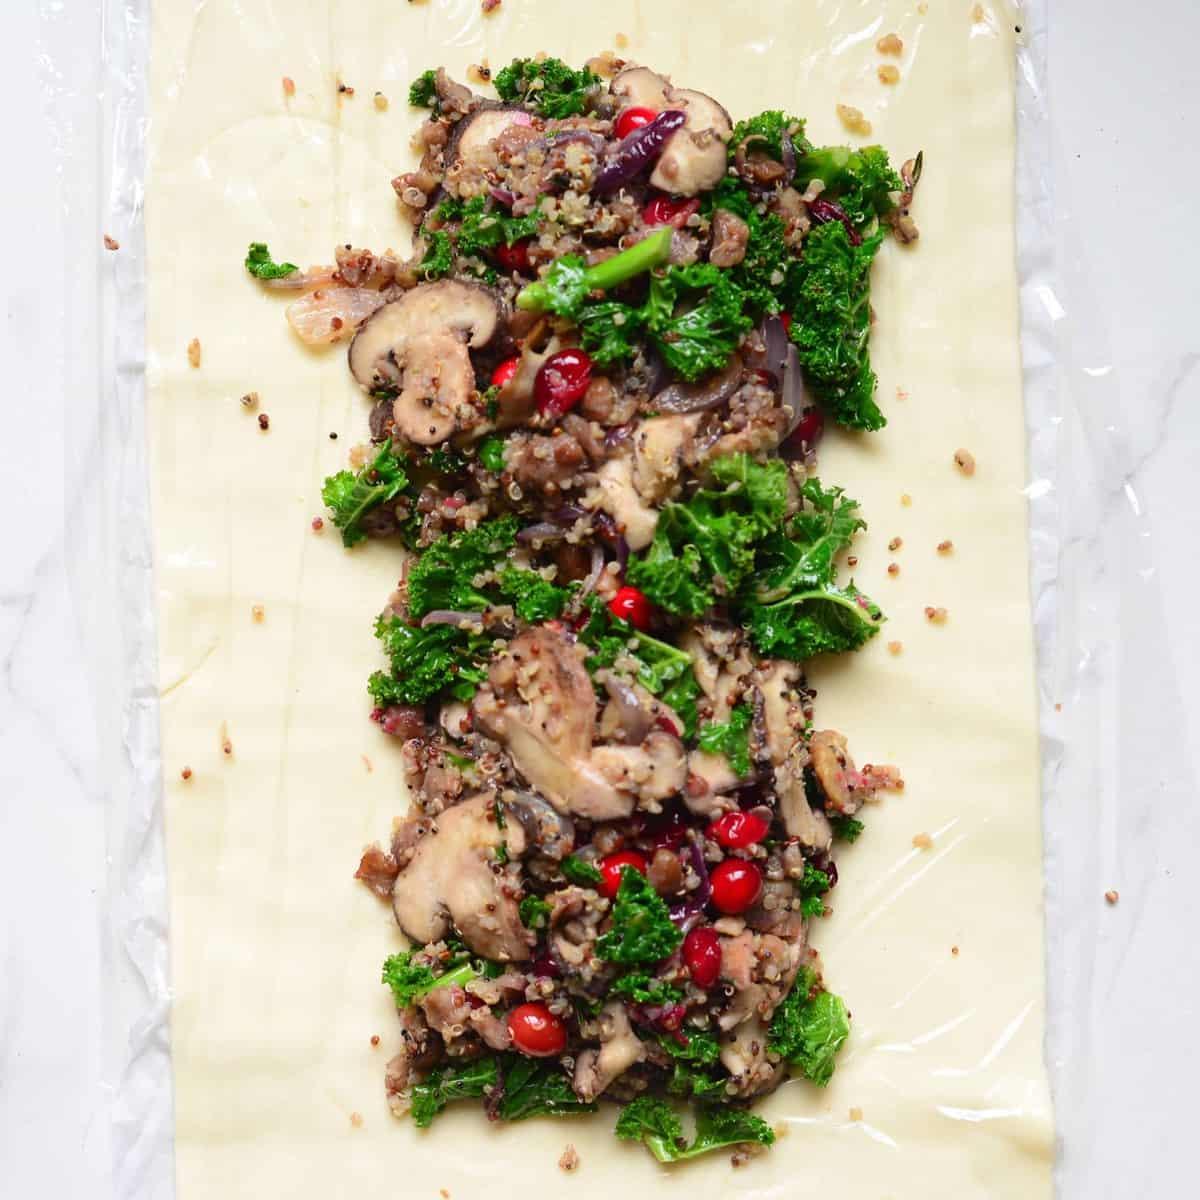 A decorated vegetarian christmas mushroom wellington with a vegan christmas recipe option.